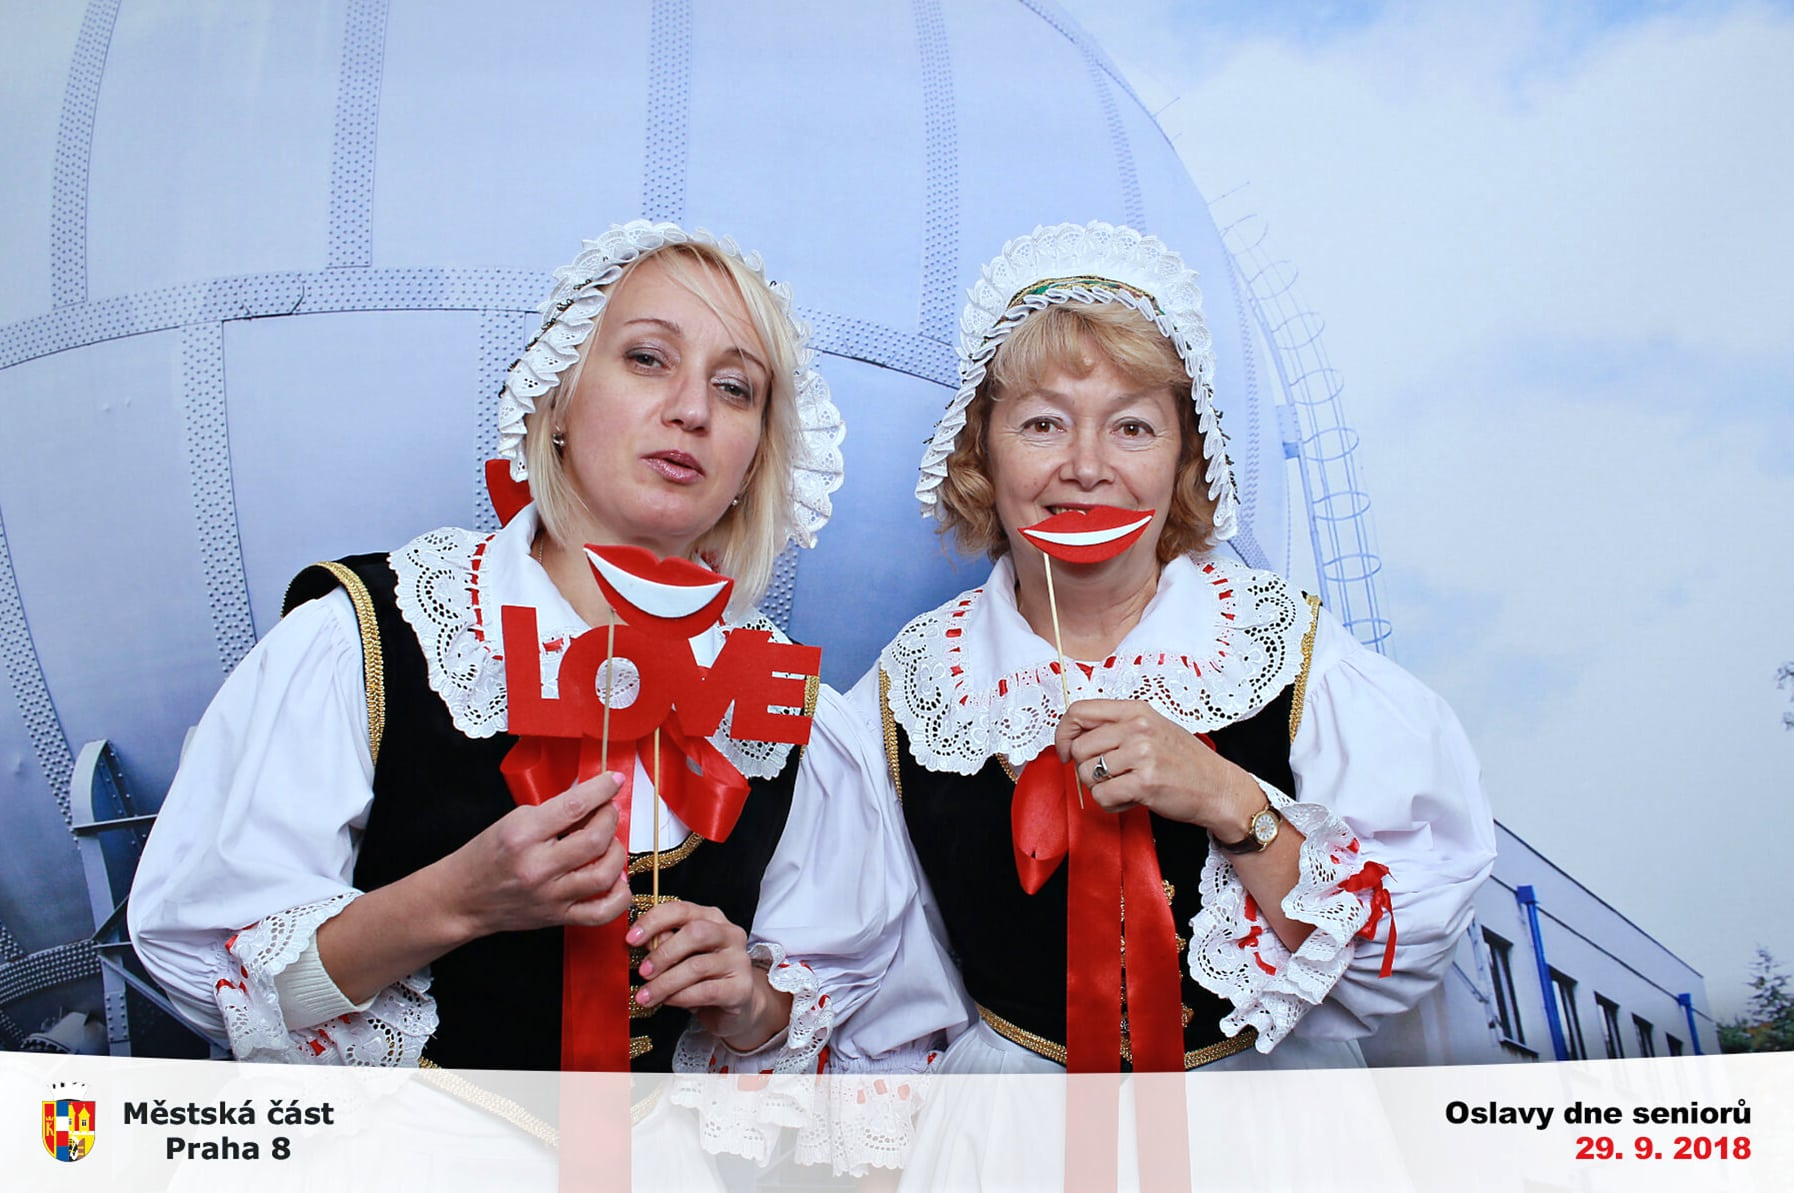 fotokoutek-oslavy-dne-senioru-29-9-2018-500385